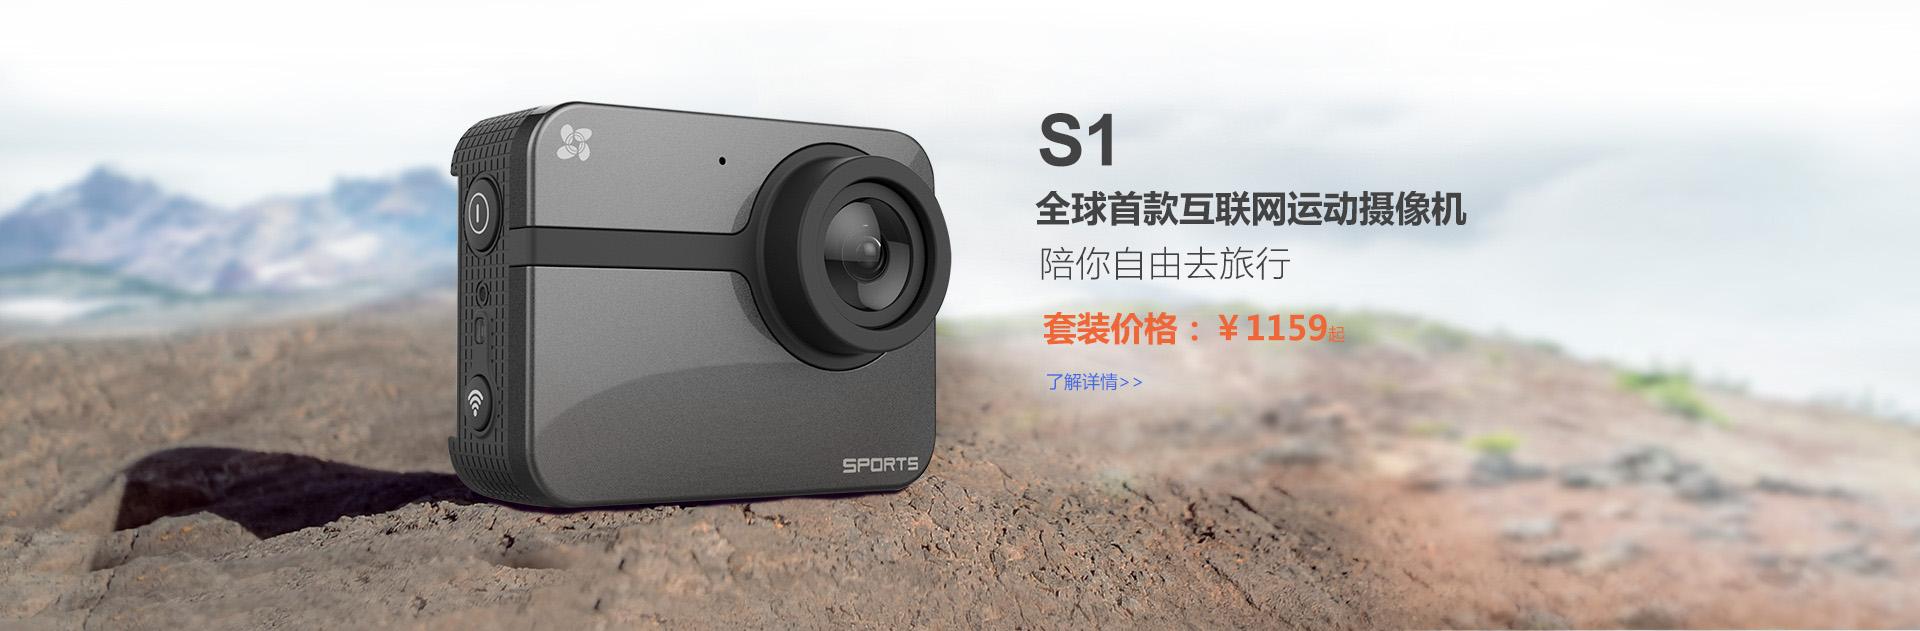 S1 互联网运动摄像机套装